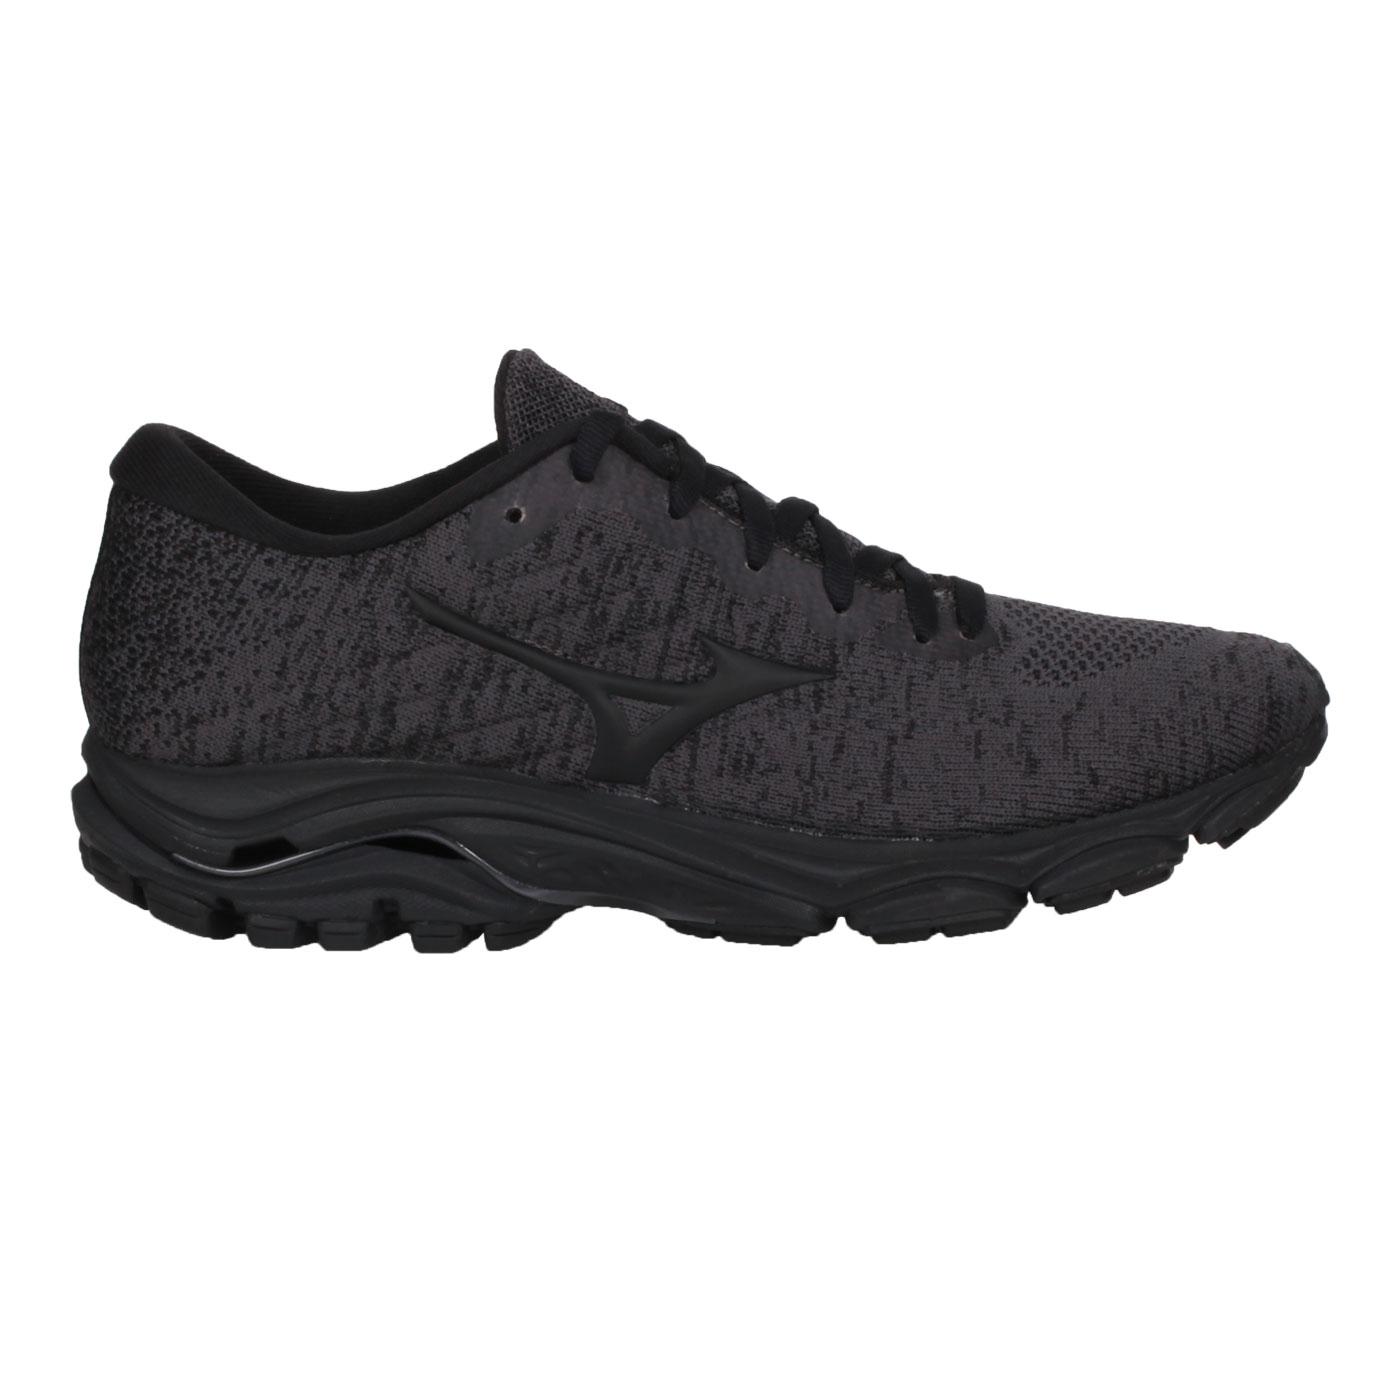 MIZUNO 女款慢跑鞋  @WAVE INSPIRE16 WAVEKNIT@J1GD201301 - 深麻灰黑